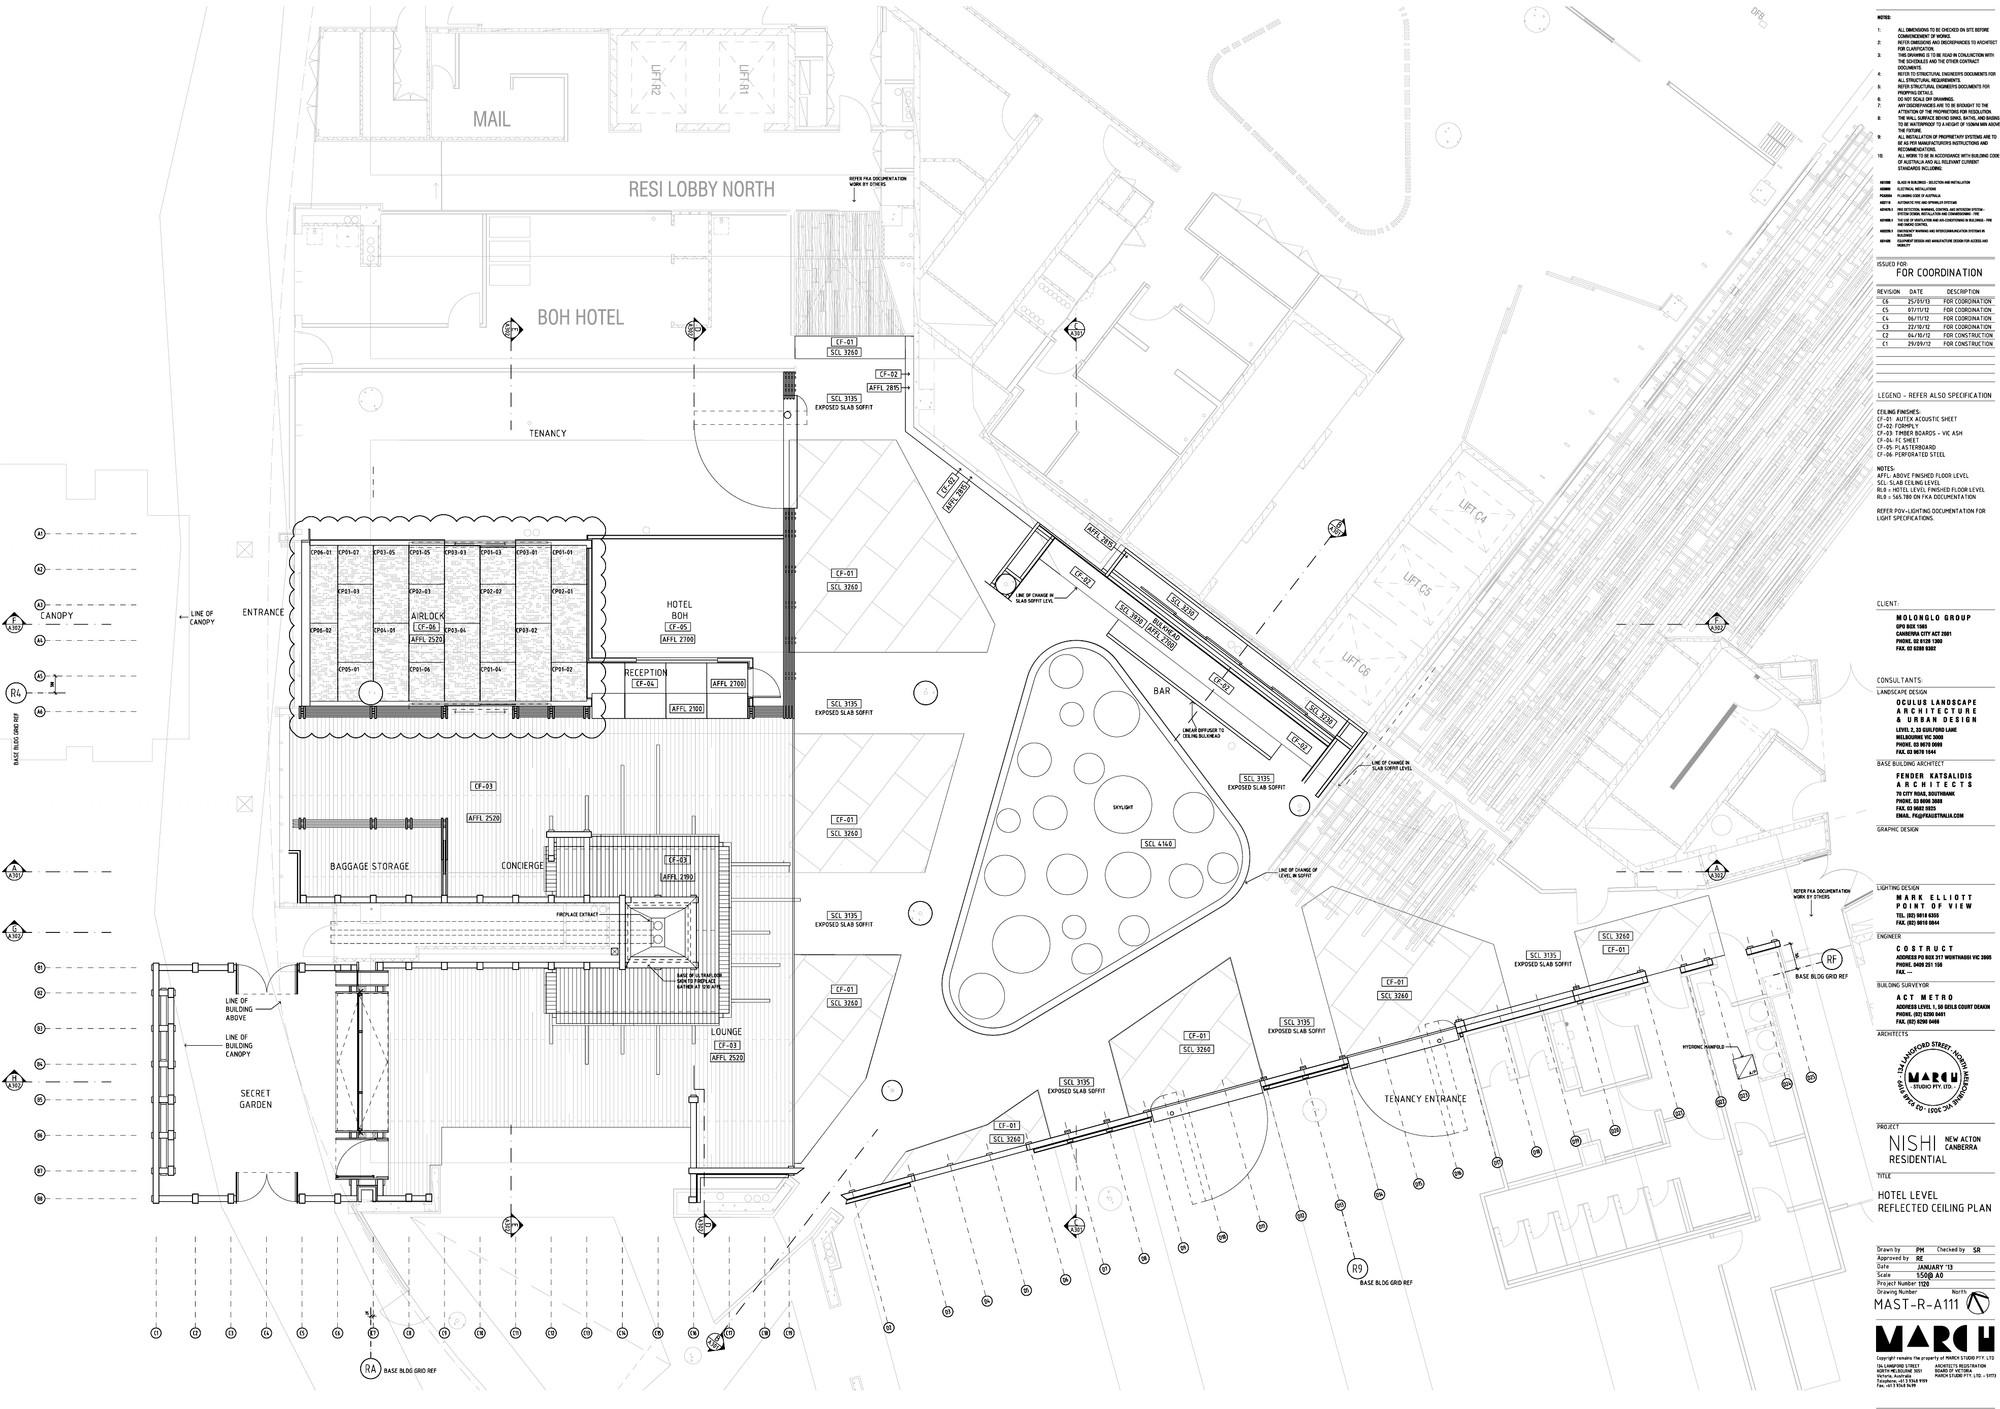 Hotel lobby floor plan - Hotel Hotel Lobby And Nishi Grand Stair Interior Floor Plan